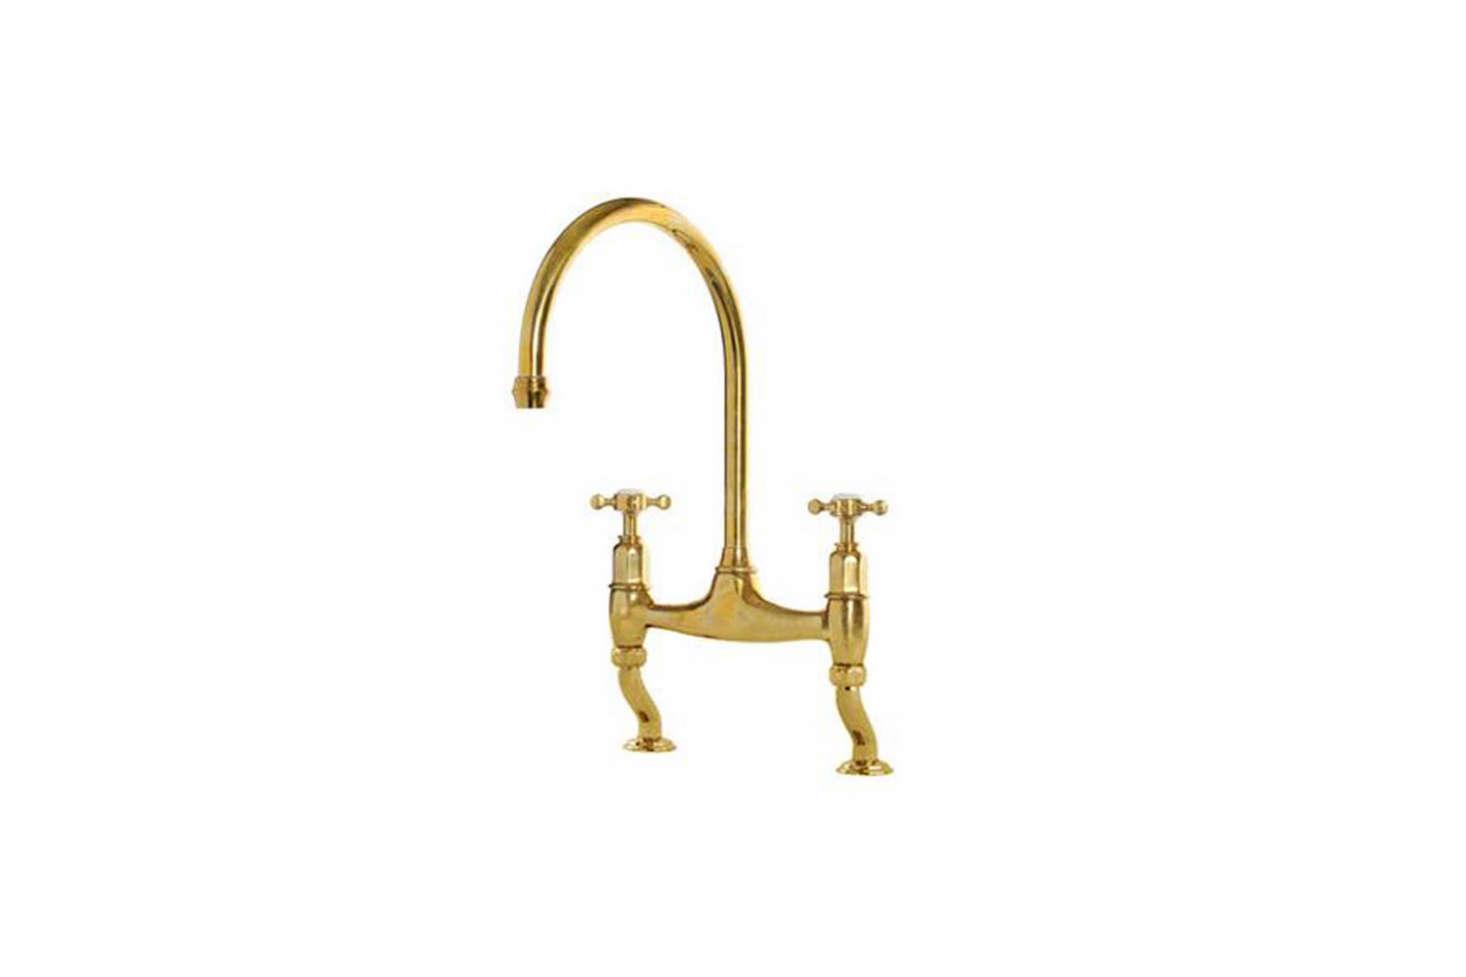 The deVOL Aged Brass Ionian Tap by Perrin & Rowe is $src=